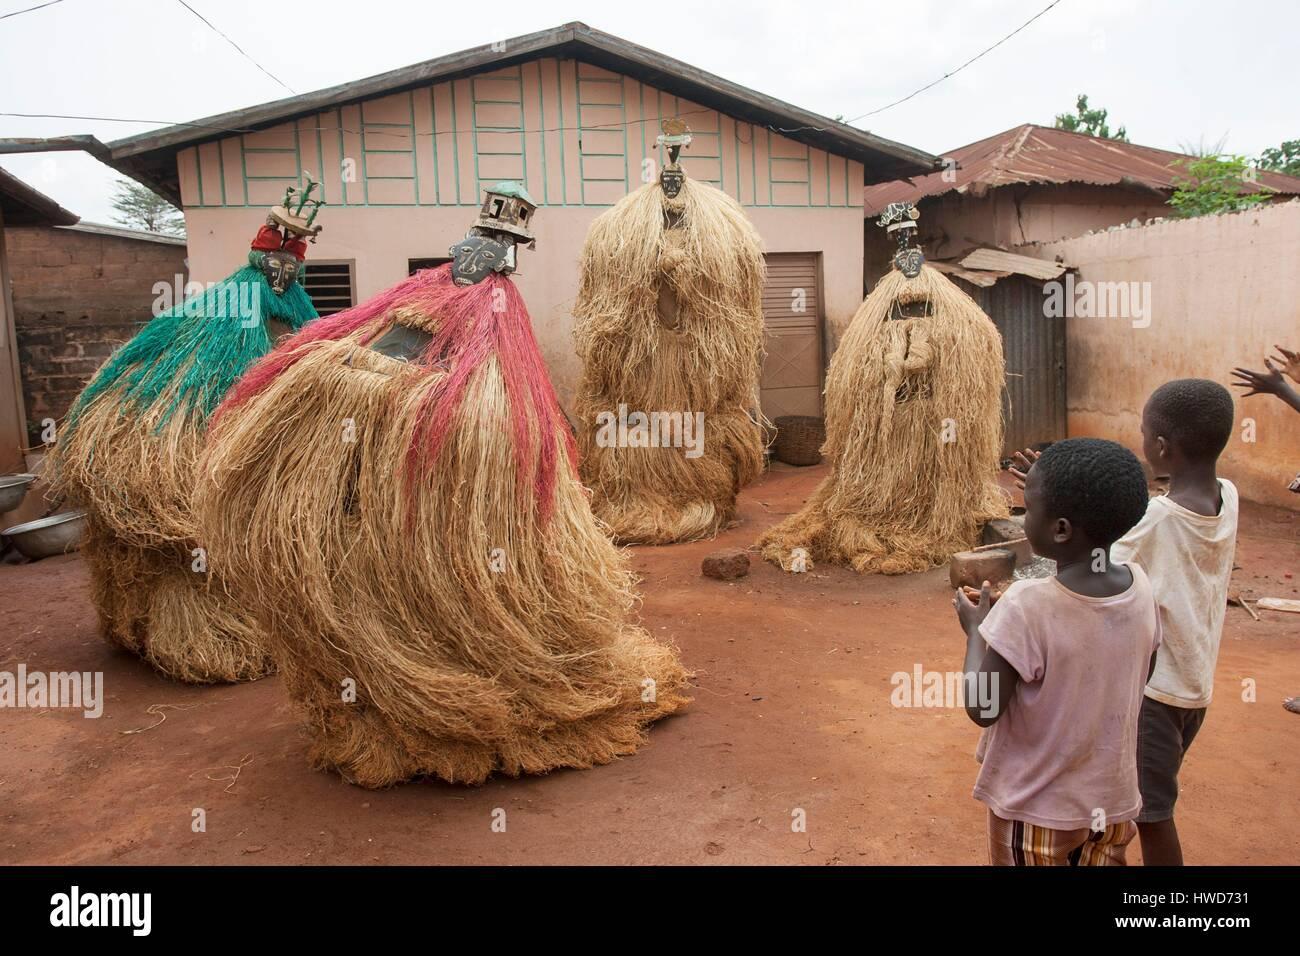 Benin, Zou Department, Abomey, Zangbeto is a mask covered with colorful raffia, Zangbeto represents nonhuman spirits, - Stock Image